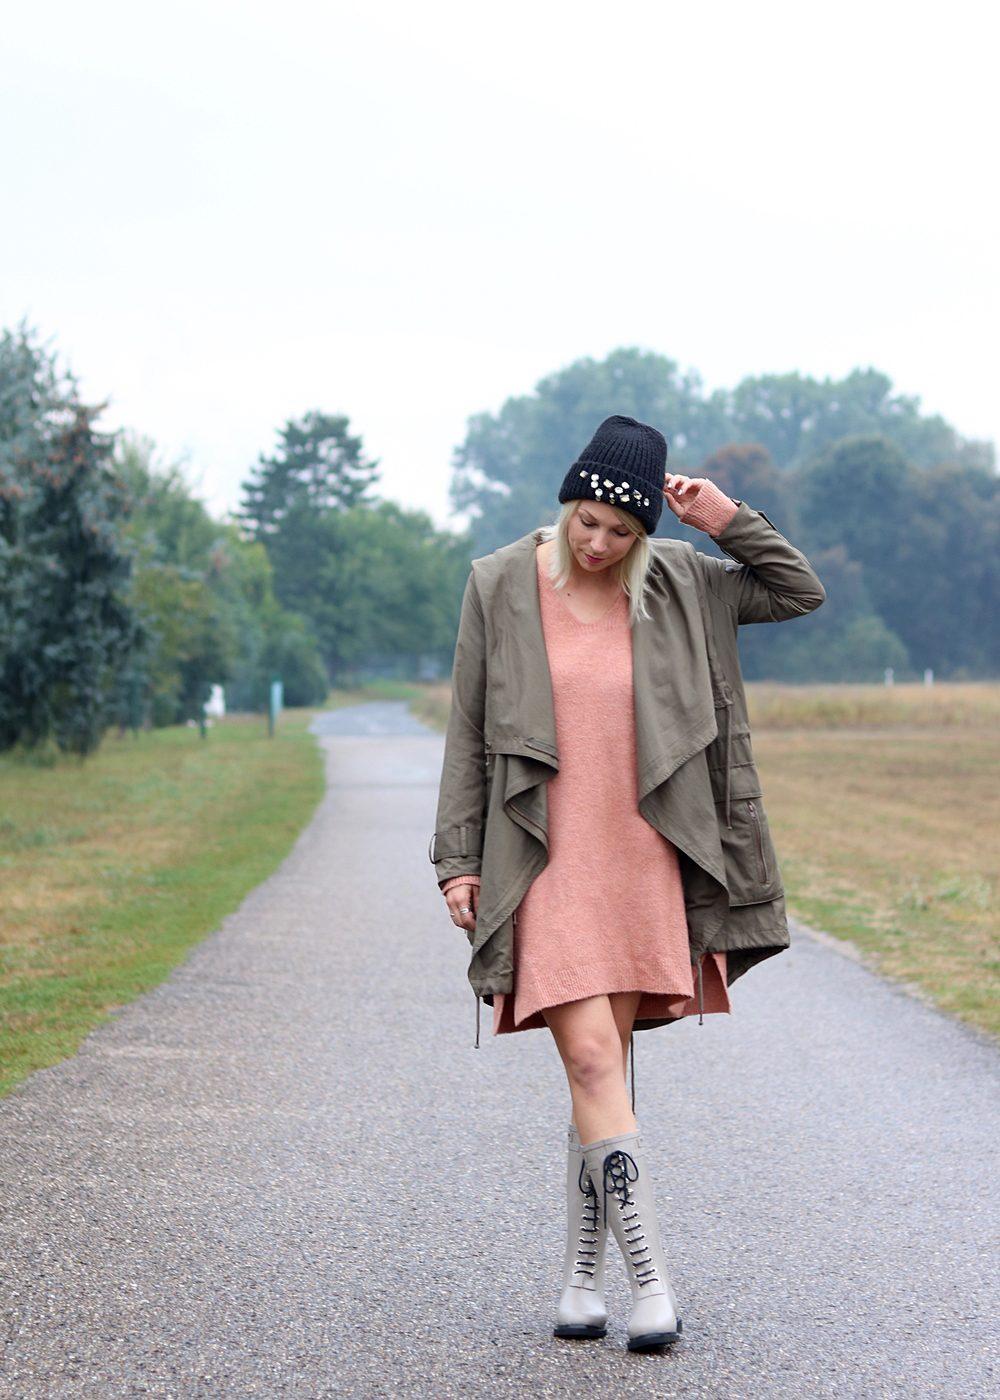 Fashionblogger Outfit Gummistiefel Ilse Jacobsen Strickkleid rosa Parka khaki Oversize Beanie mit Glitzersteinen (4)